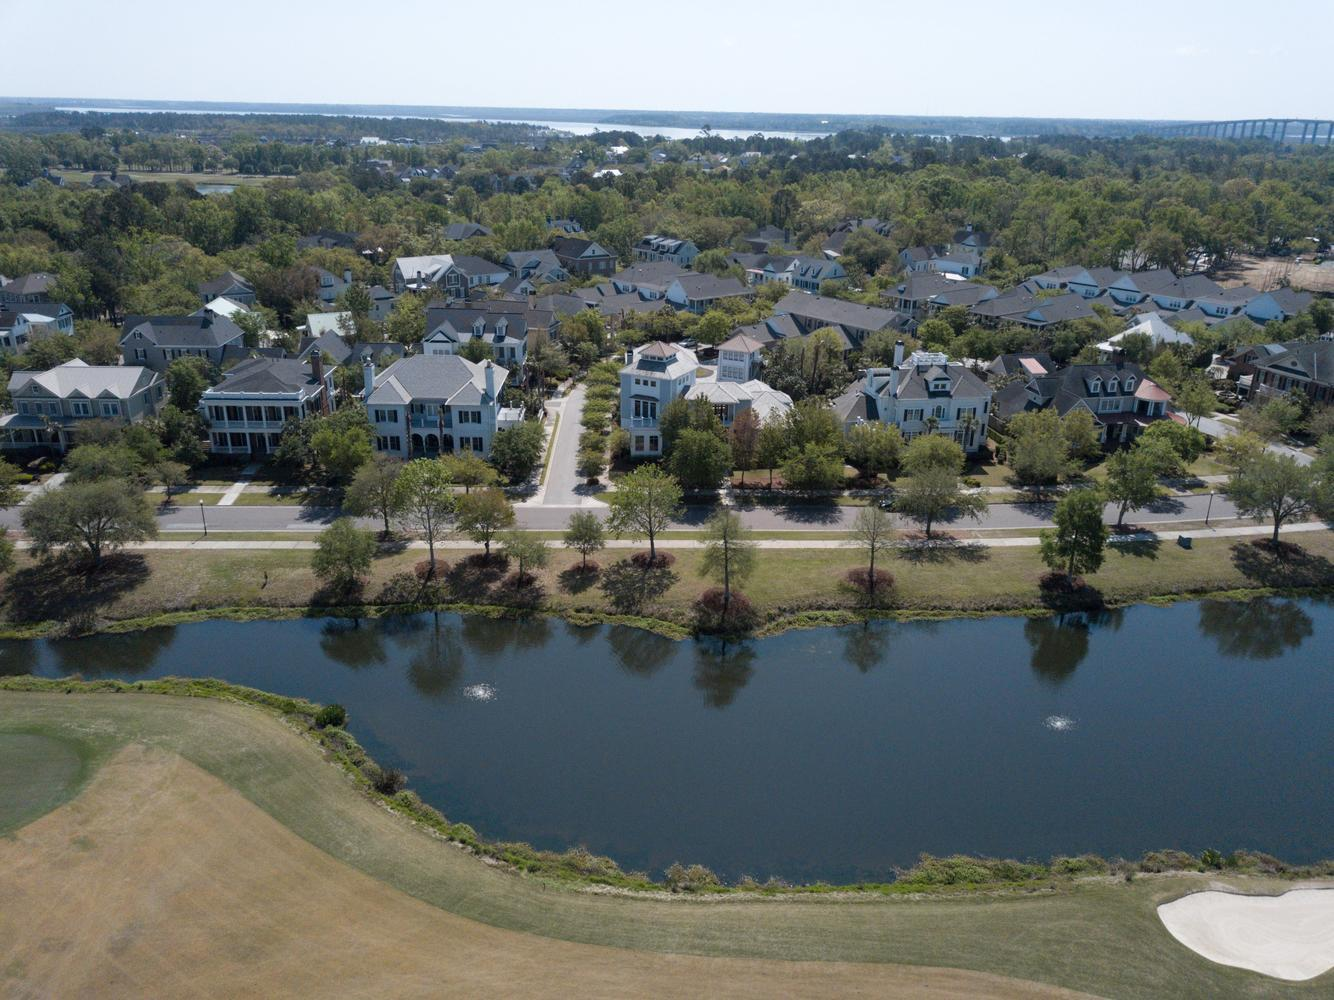 639 Island Park Drive, Charleston, 29492, 5 Bedrooms Bedrooms, ,6 BathroomsBathrooms,Residential,For Sale,Island Park,21004699